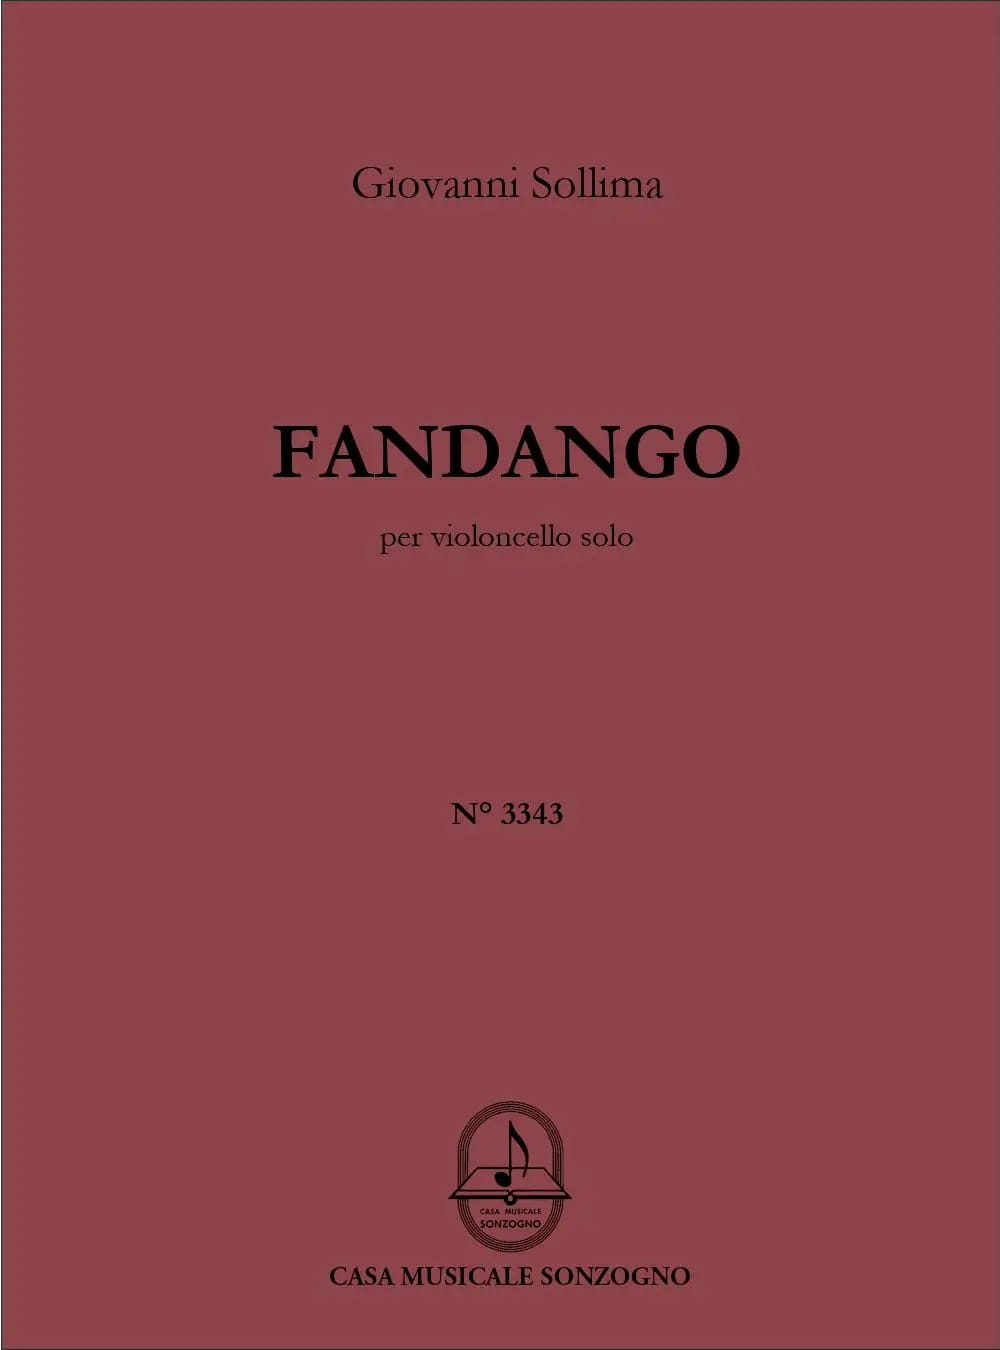 Fandango - Giovanni Sollima - Partition - laflutedepan.com